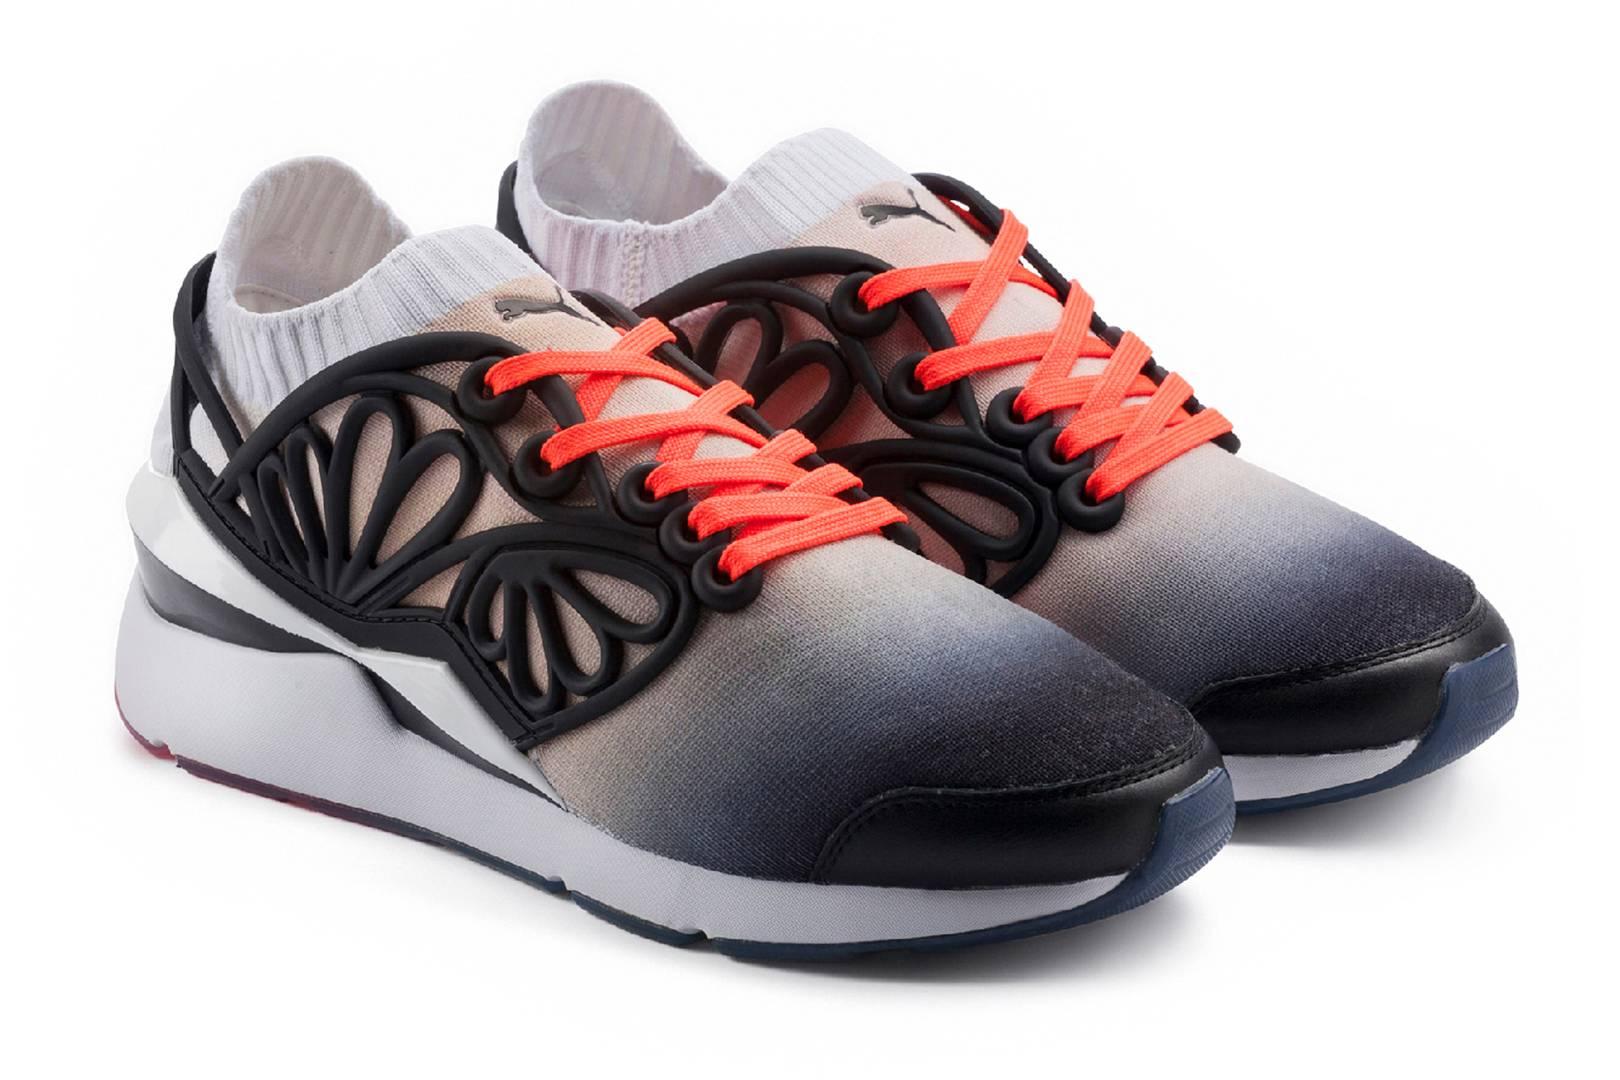 chaussures de sport 5761e 9bec6 http://pattern.anandasatriatravel.com/exalt/12/awah ...